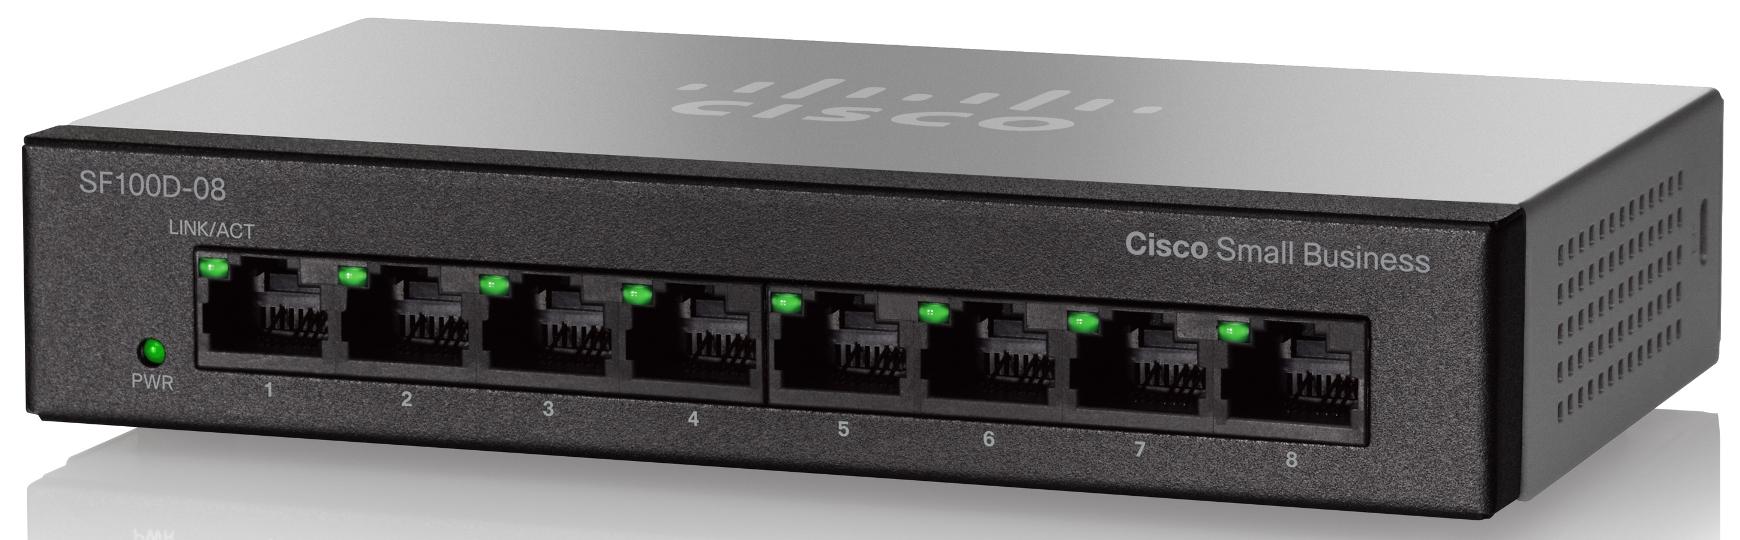 Cisco SF100D-08, 8x10/100 Switch (SF100D-08-EU)